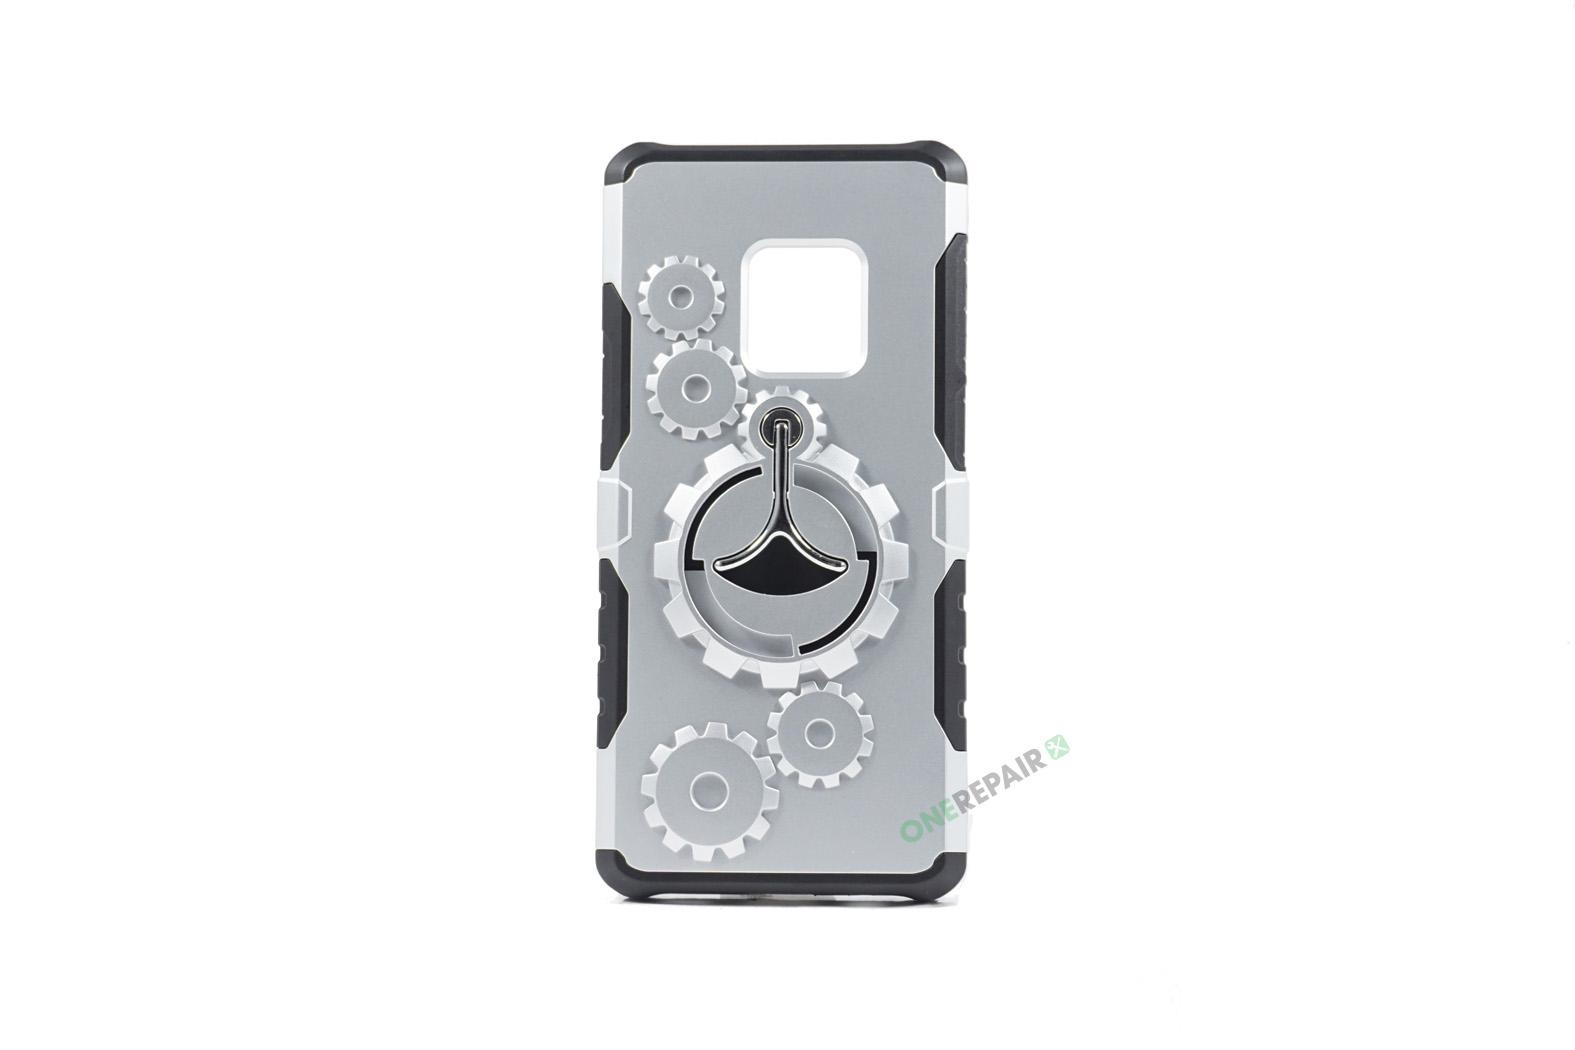 351904_Samsung_S9_Gear_Hard_Case_Hardcase_Haandvaerkercover_Haandvaerker_Cover_Greb_Soelv_OneRepair_00001